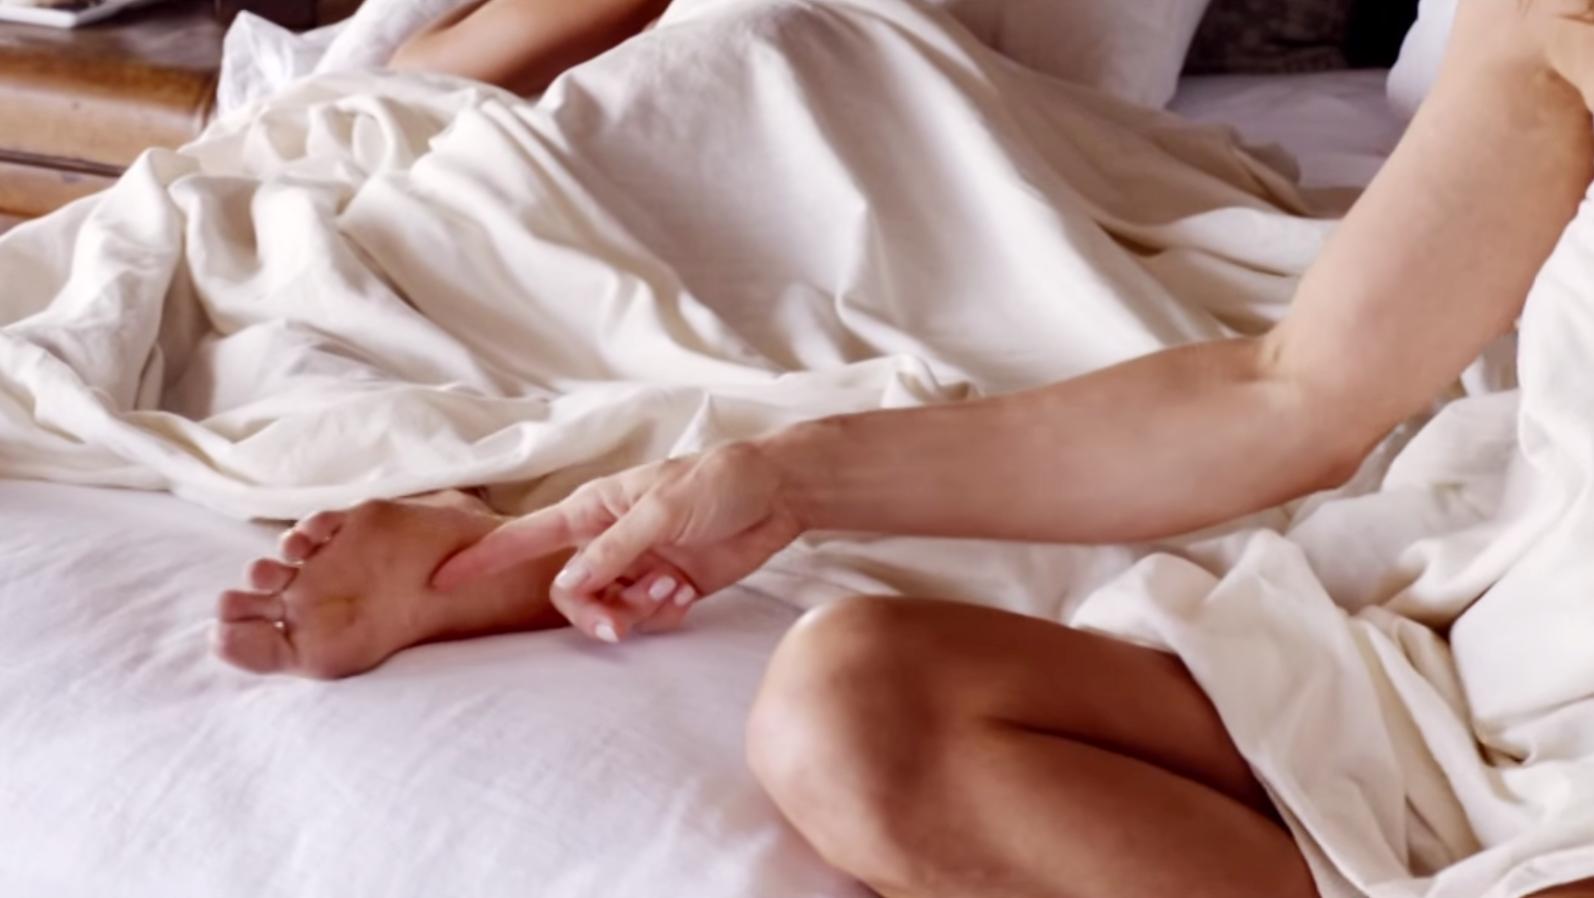 lesbian foot pics wedding gay porn